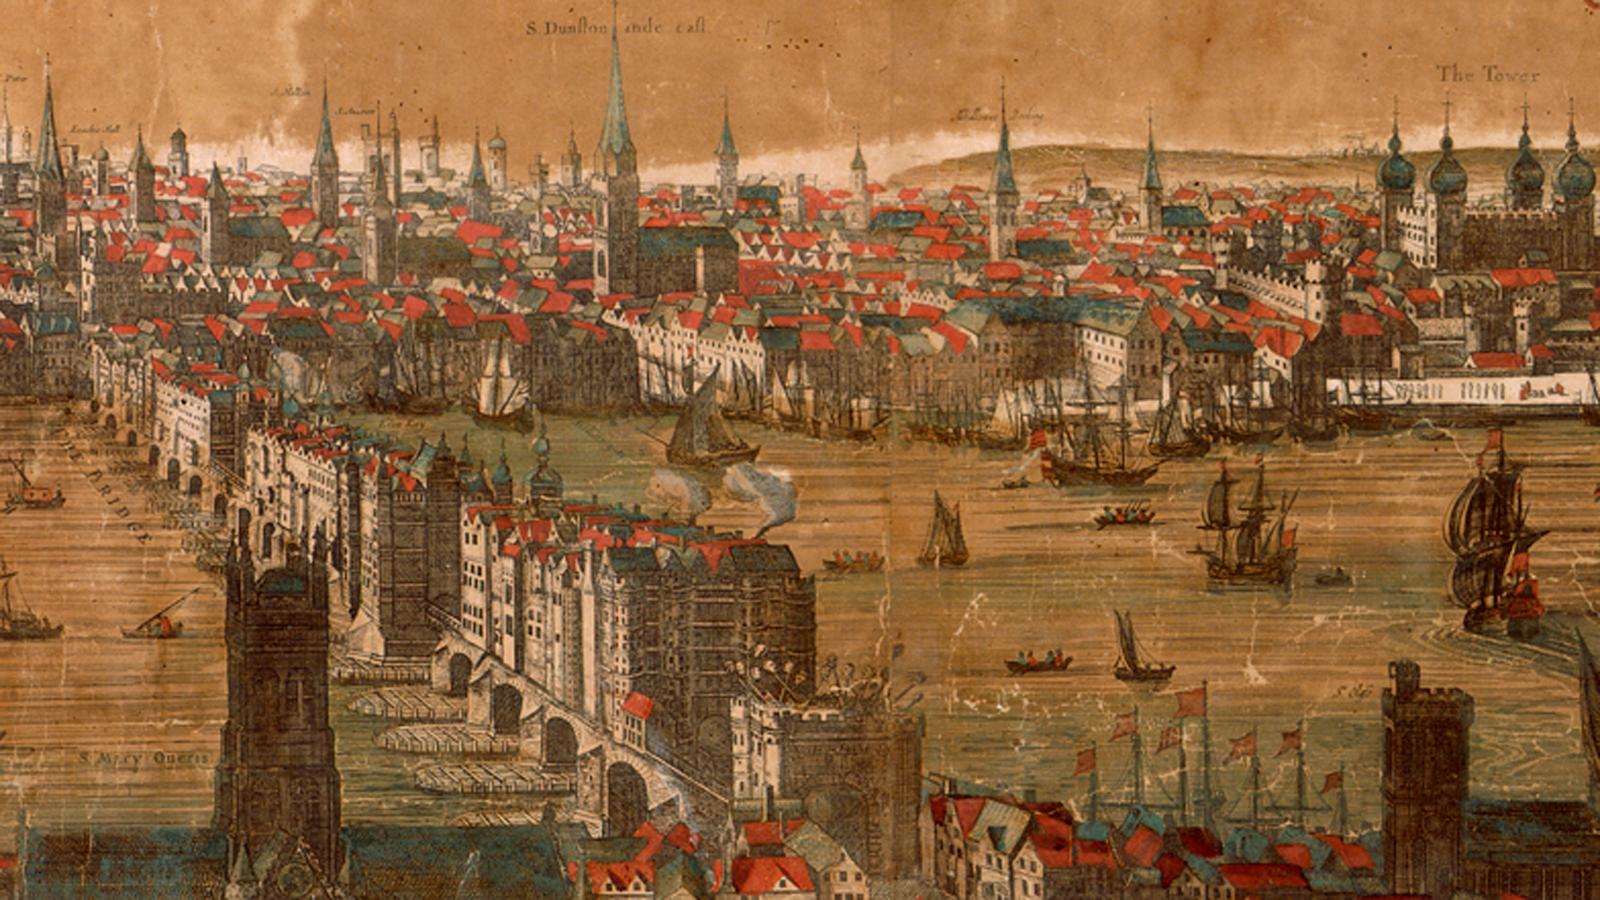 Cities in Elizabethan England